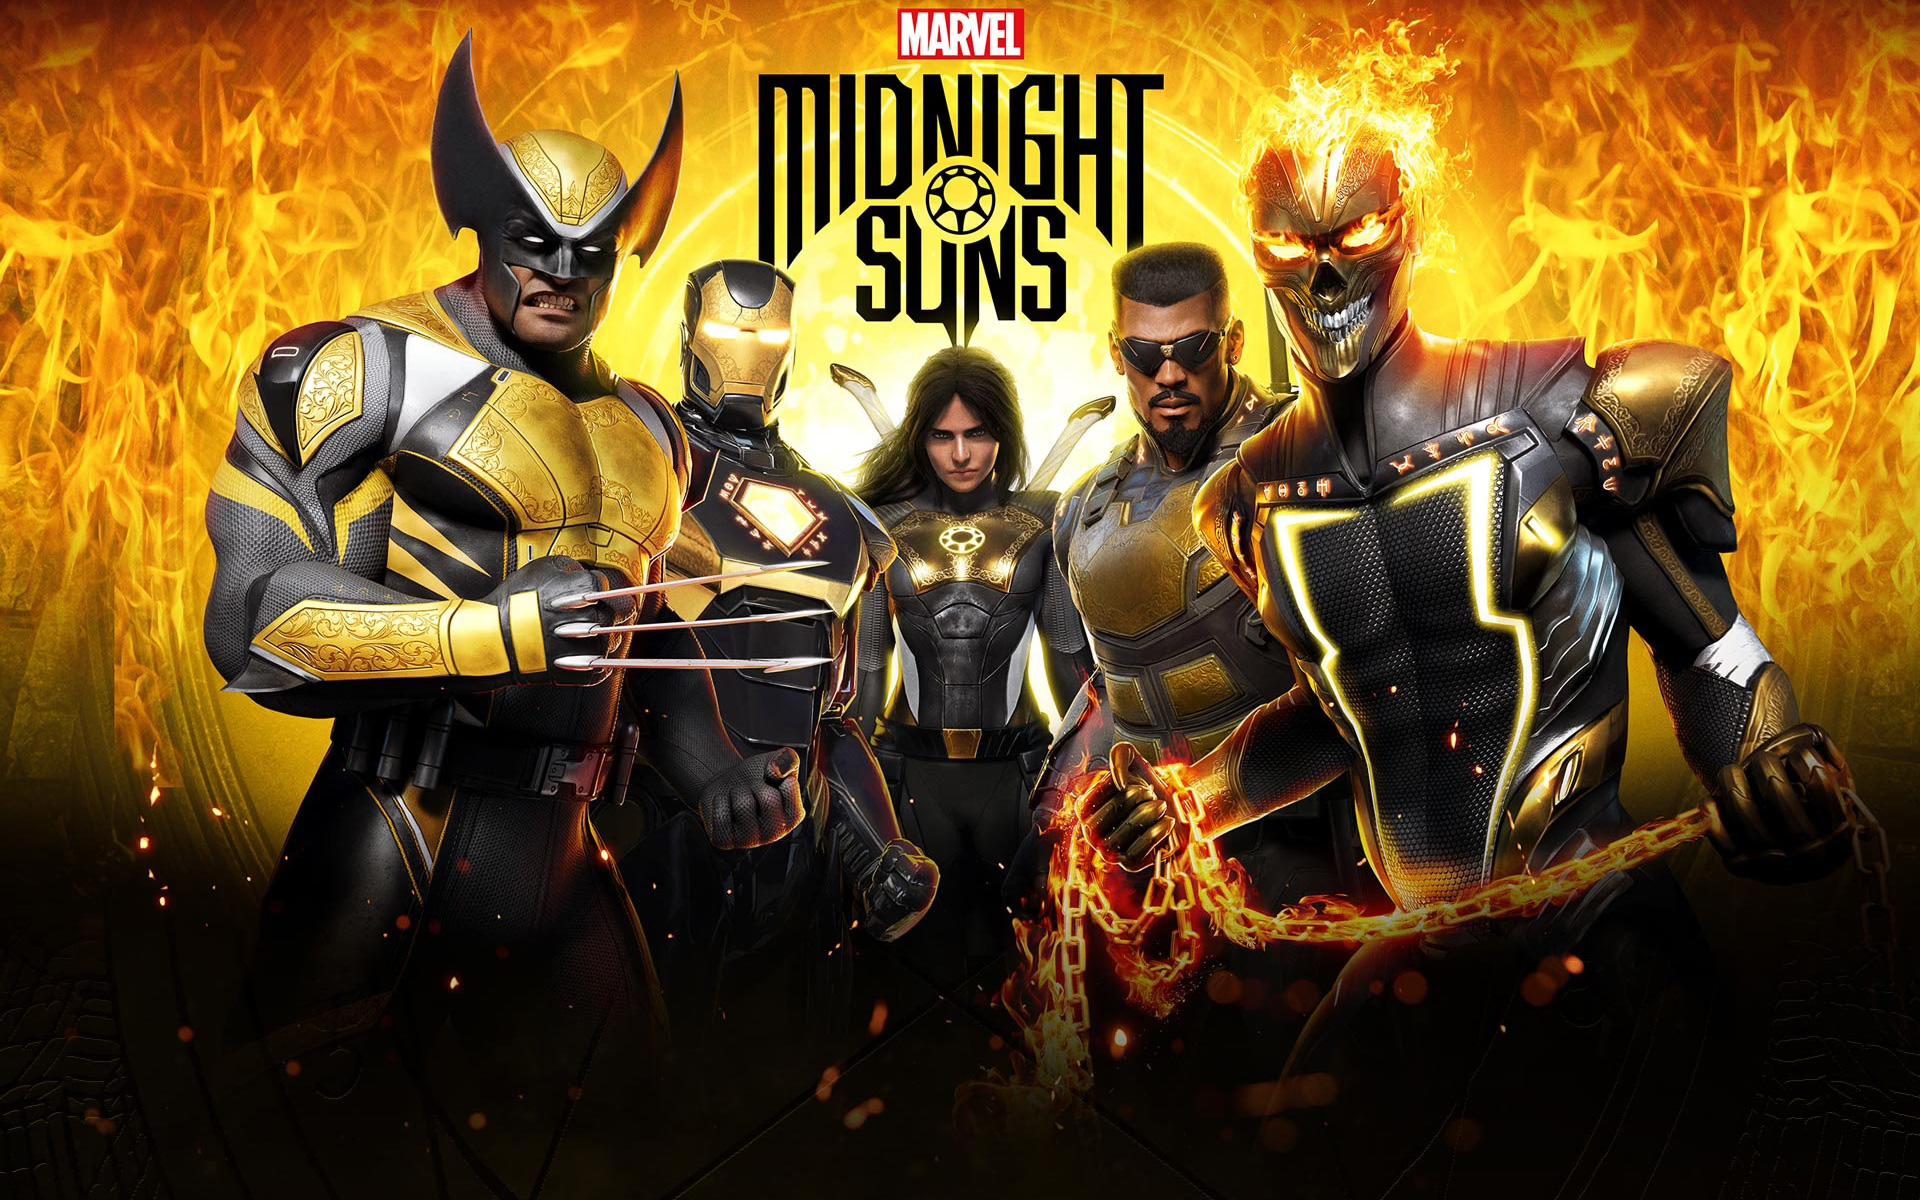 Free Marvel's Midnight Suns Wallpaper in 1920x1200